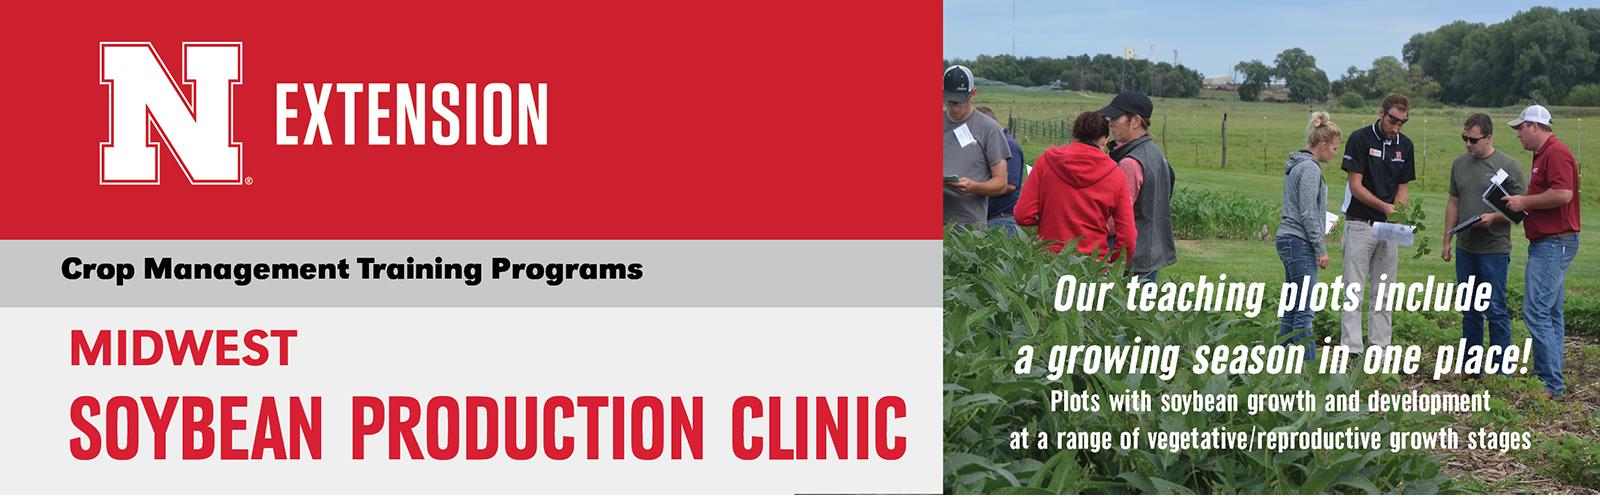 Midwest Soybean Production Crop Management Diagnostic Clinic Header